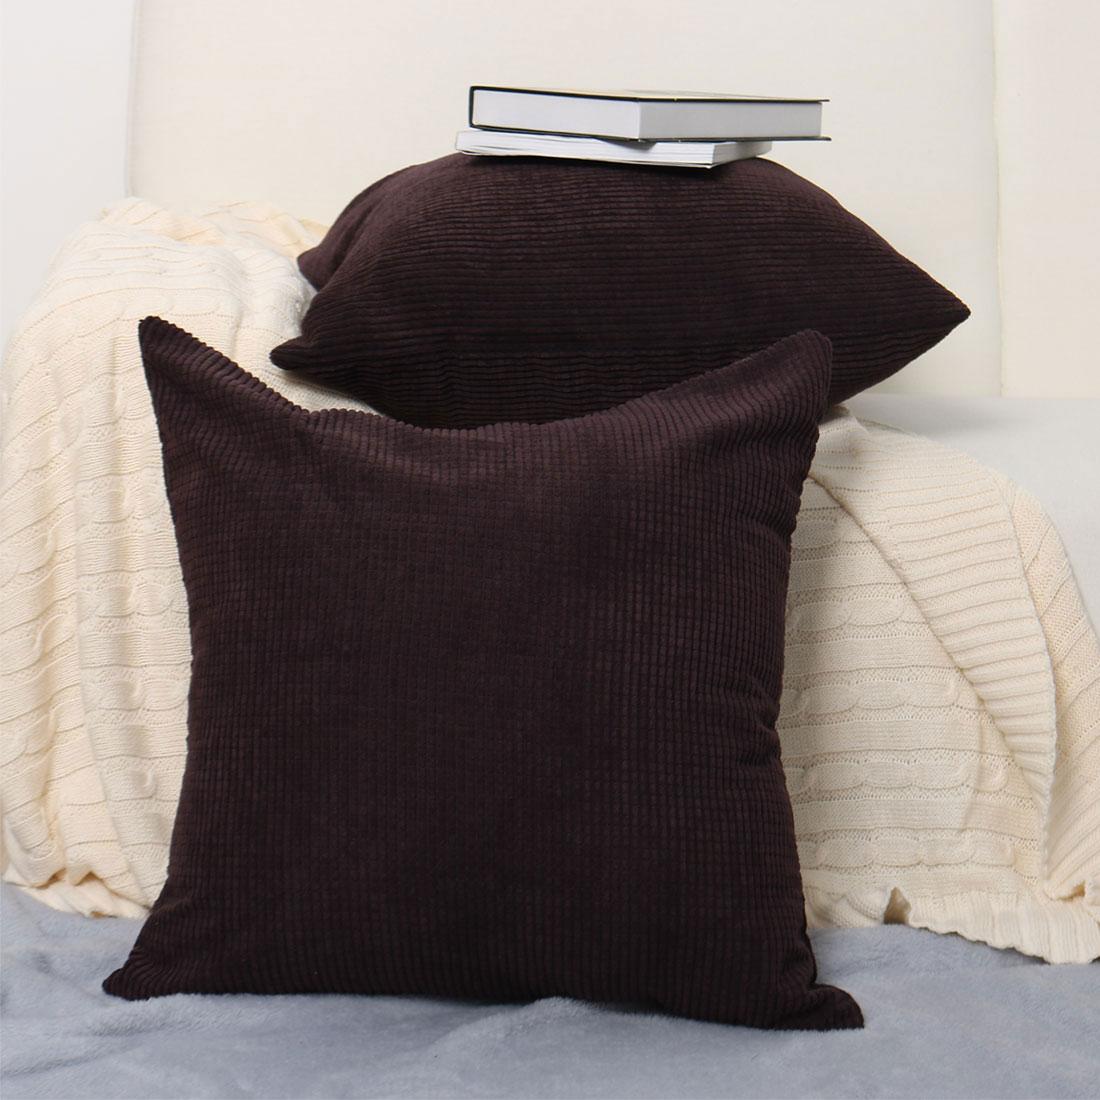 Home Sofa Cushion Cover Corduroy Striped Decorative Throw Pillow Case Set